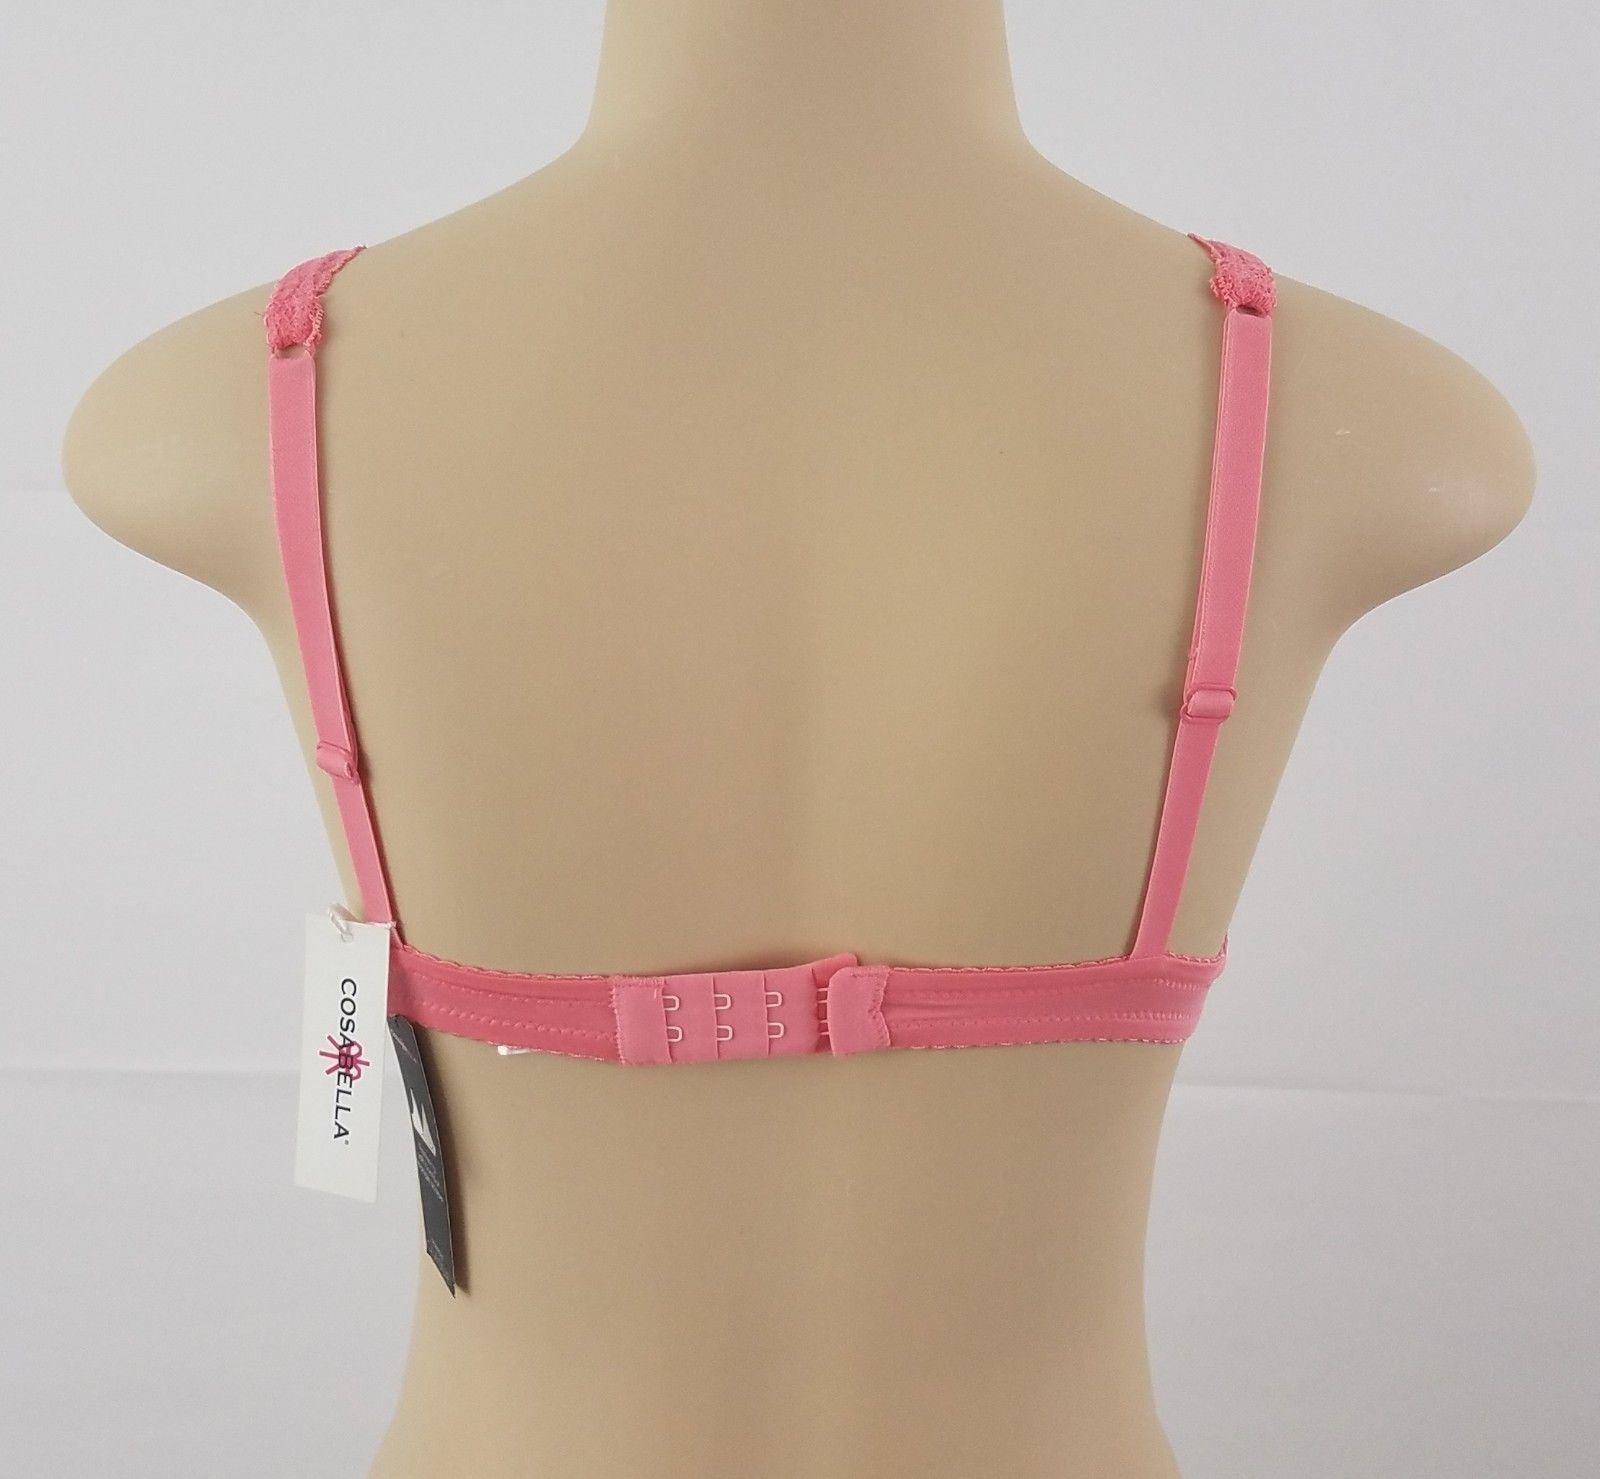 463fc082ac066 Cosabella Women s Italia Soft Bralette Bra Itali1301 Pink Rose S